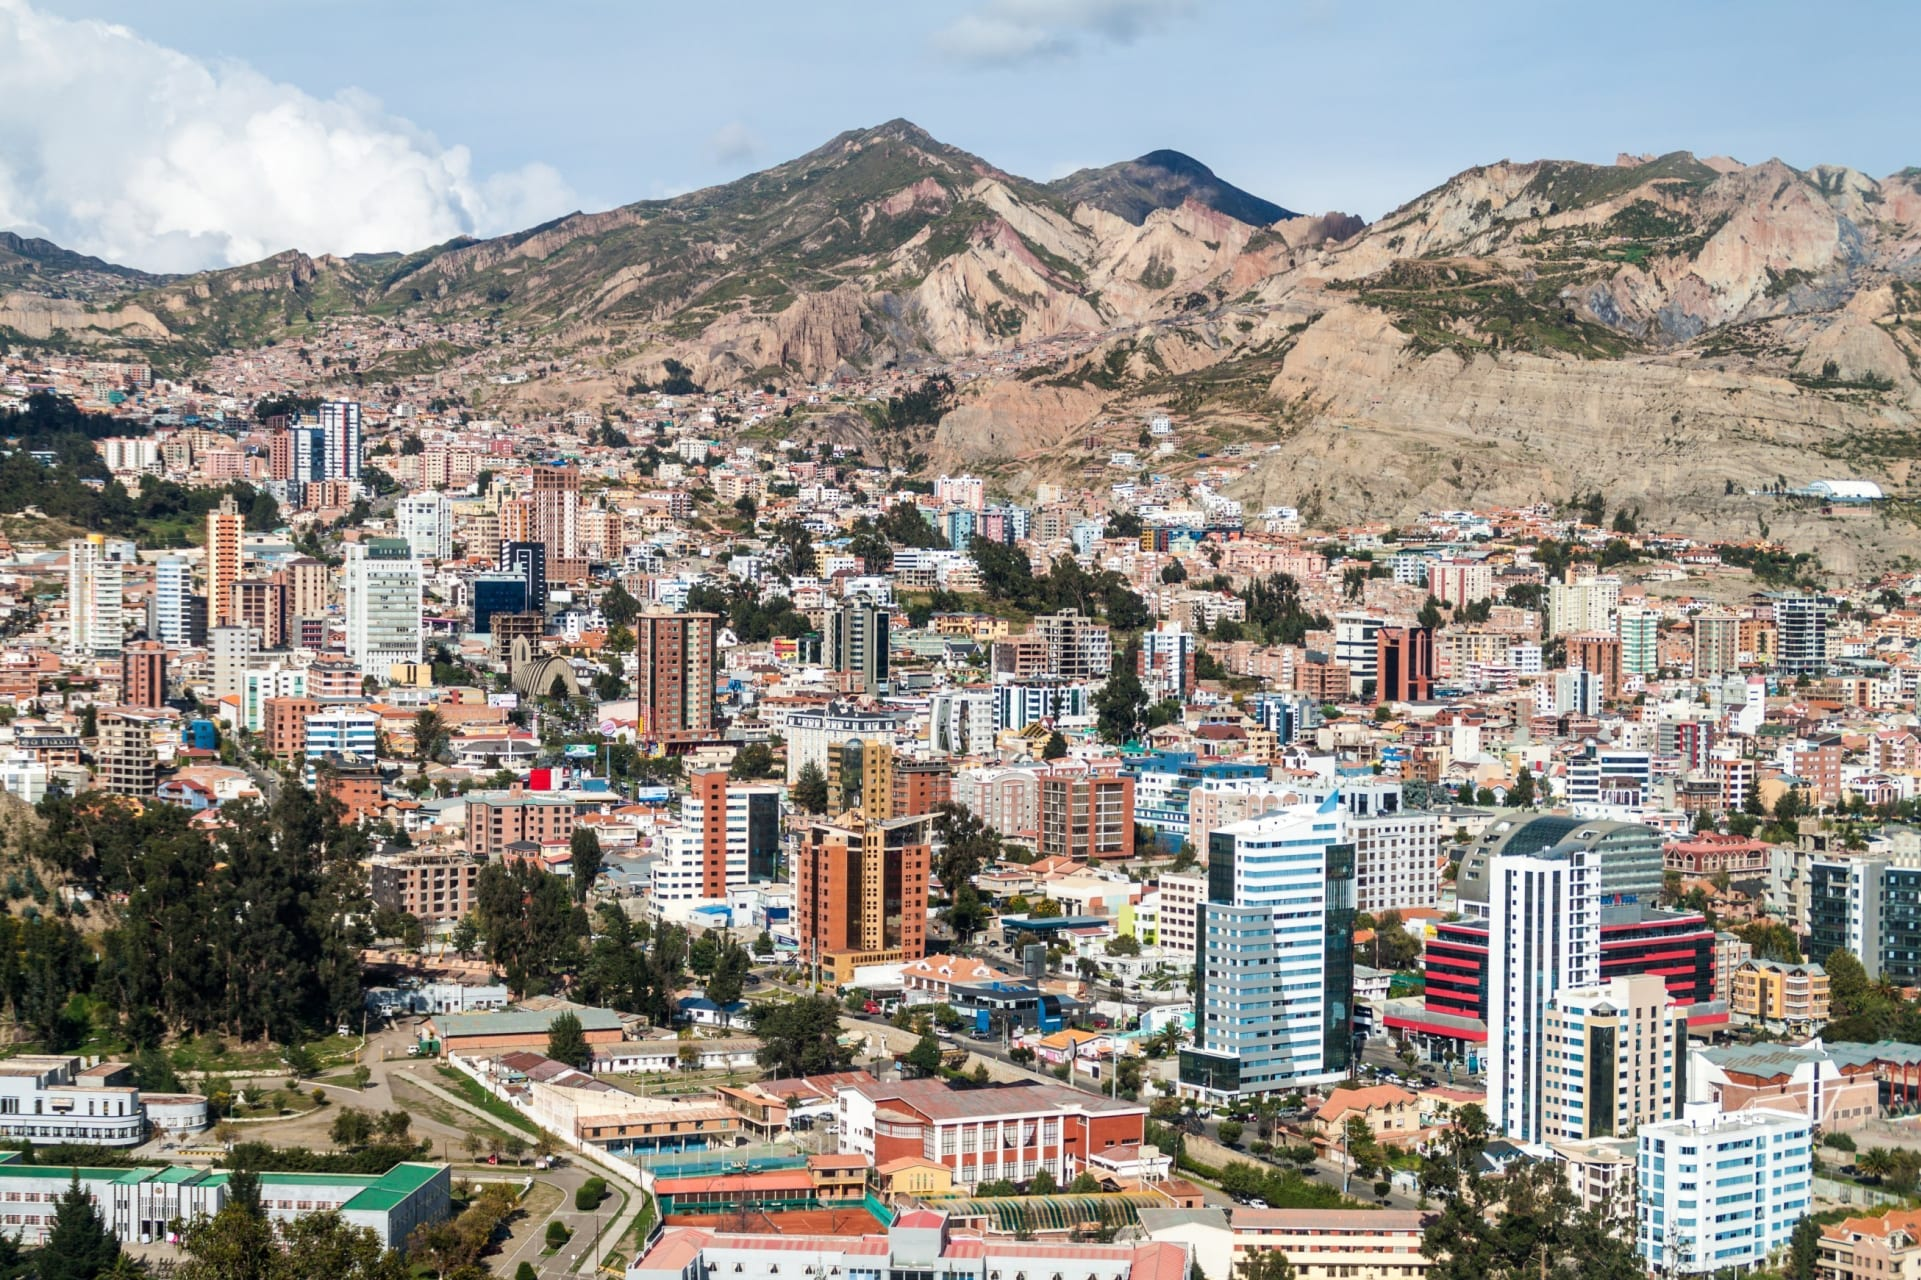 La Paz - South Zone: Green Cable Car